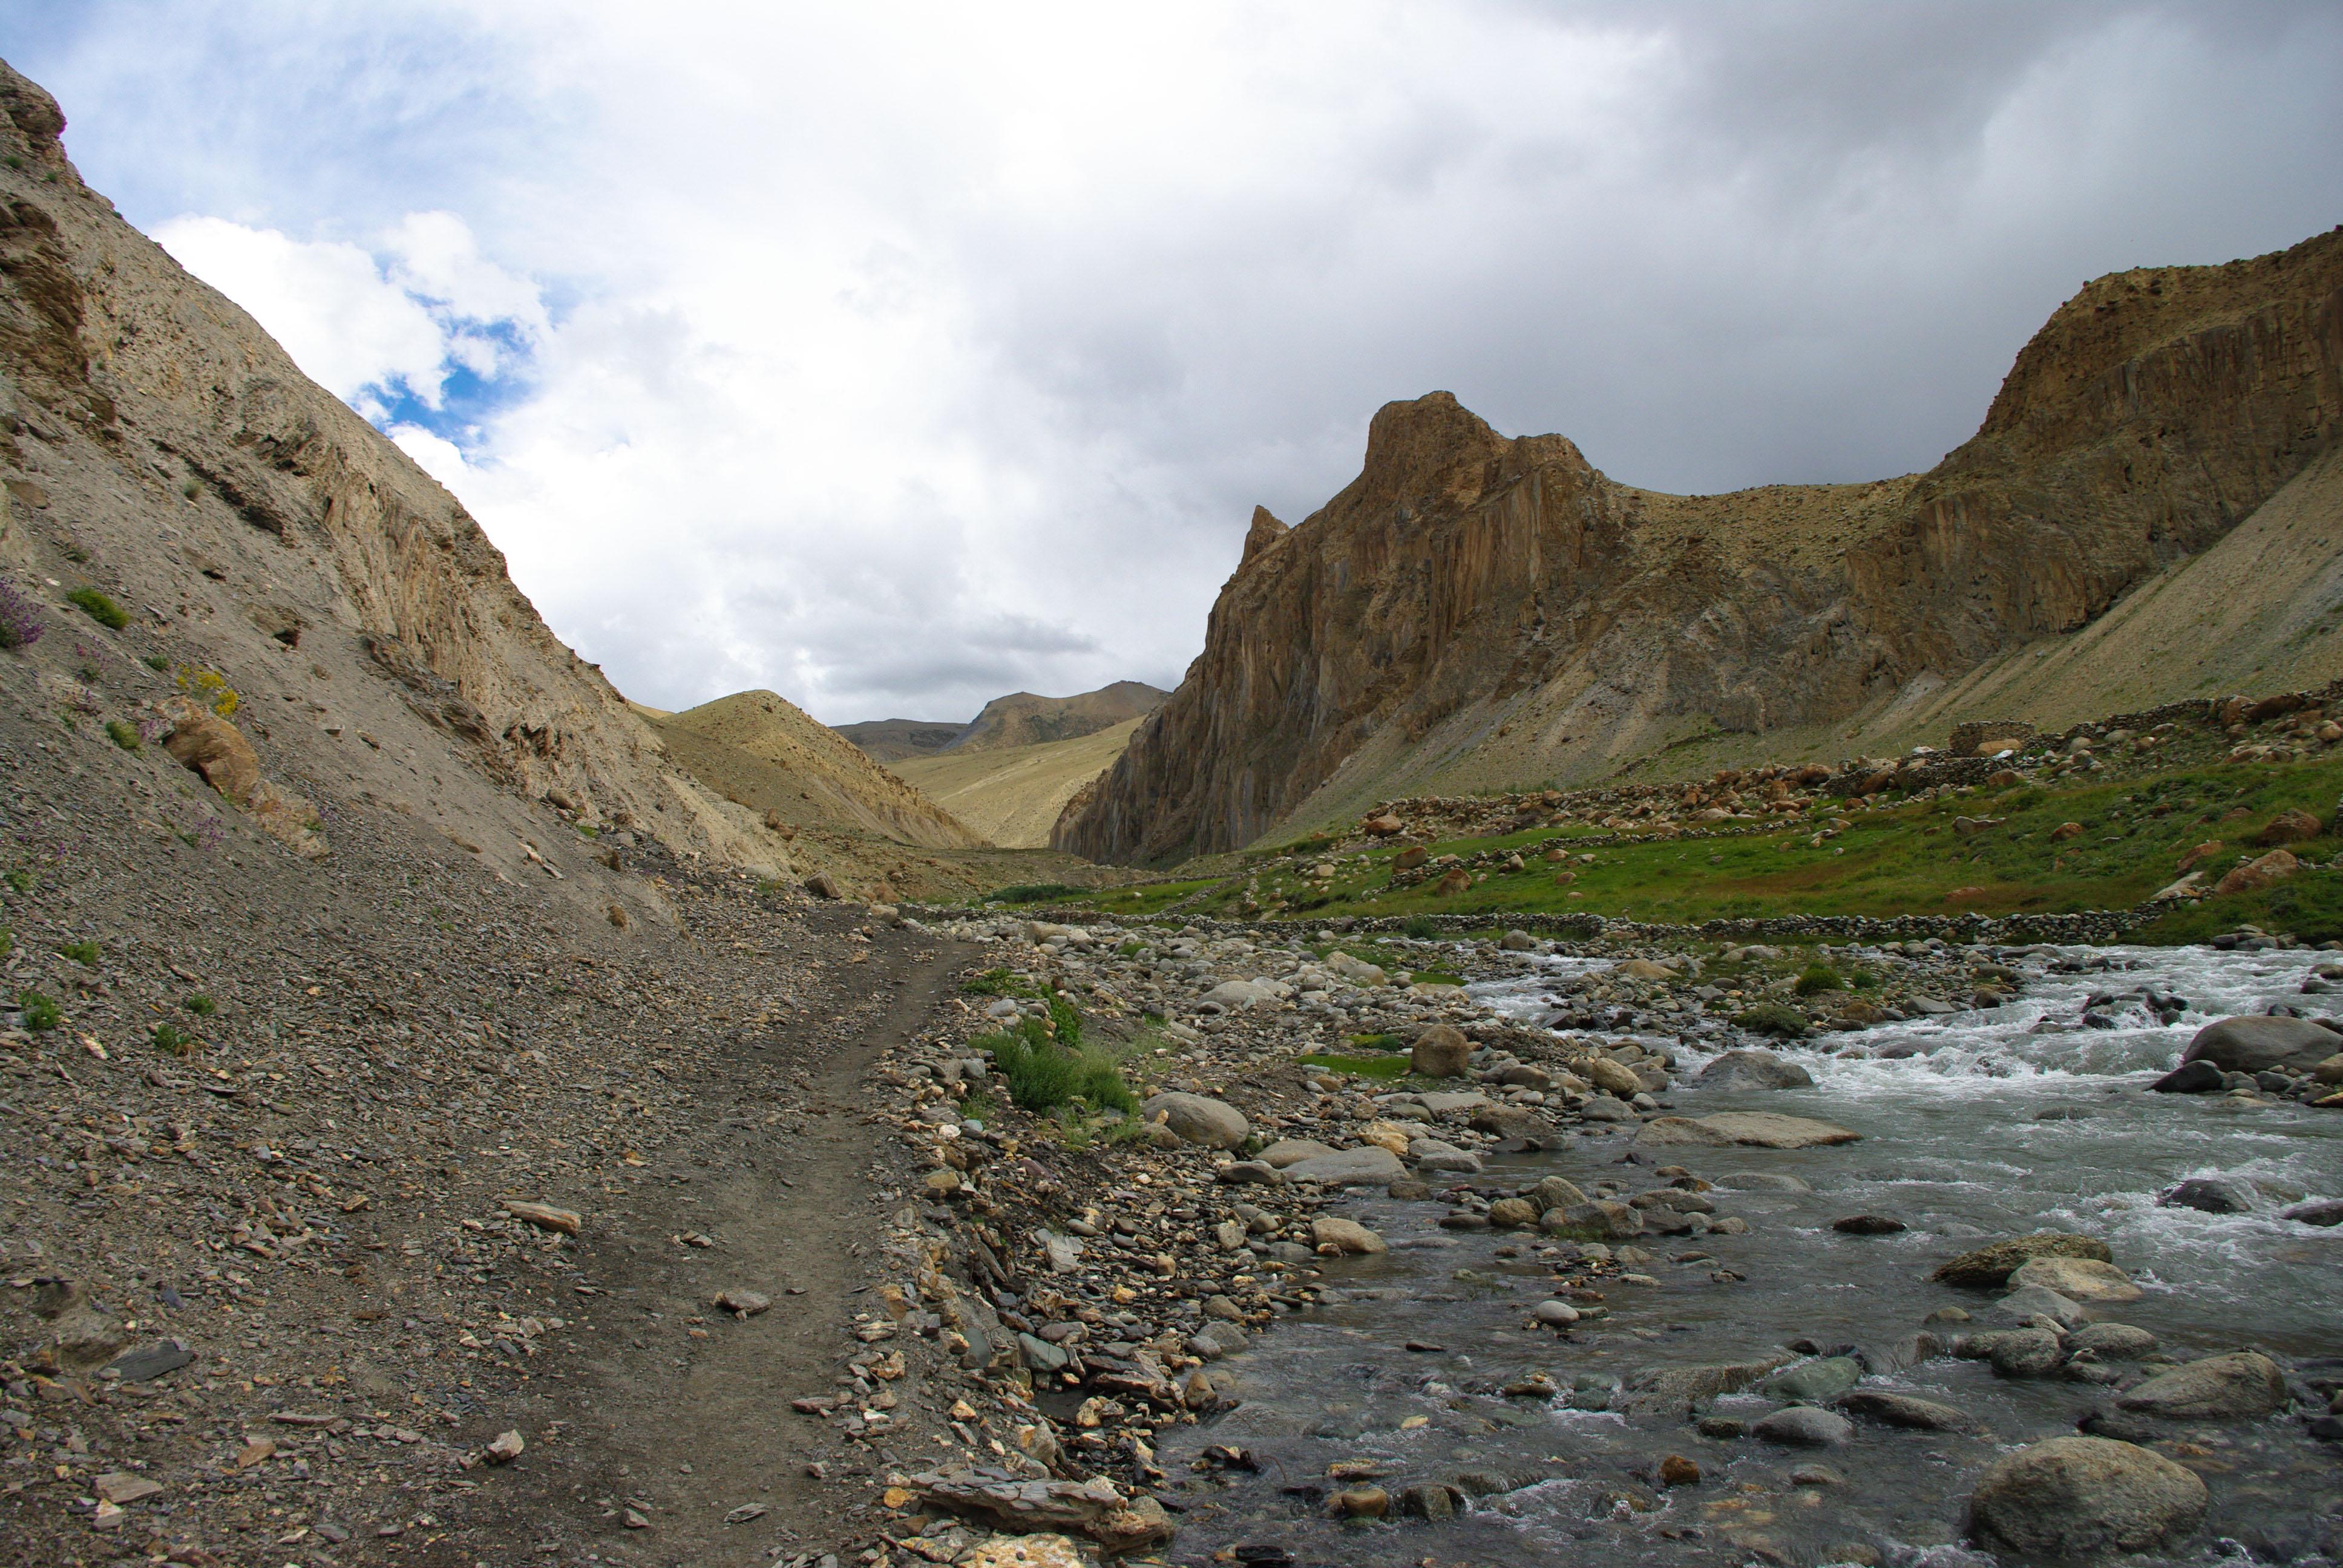 Тропа в Ладакхе и горная река, Гималаи